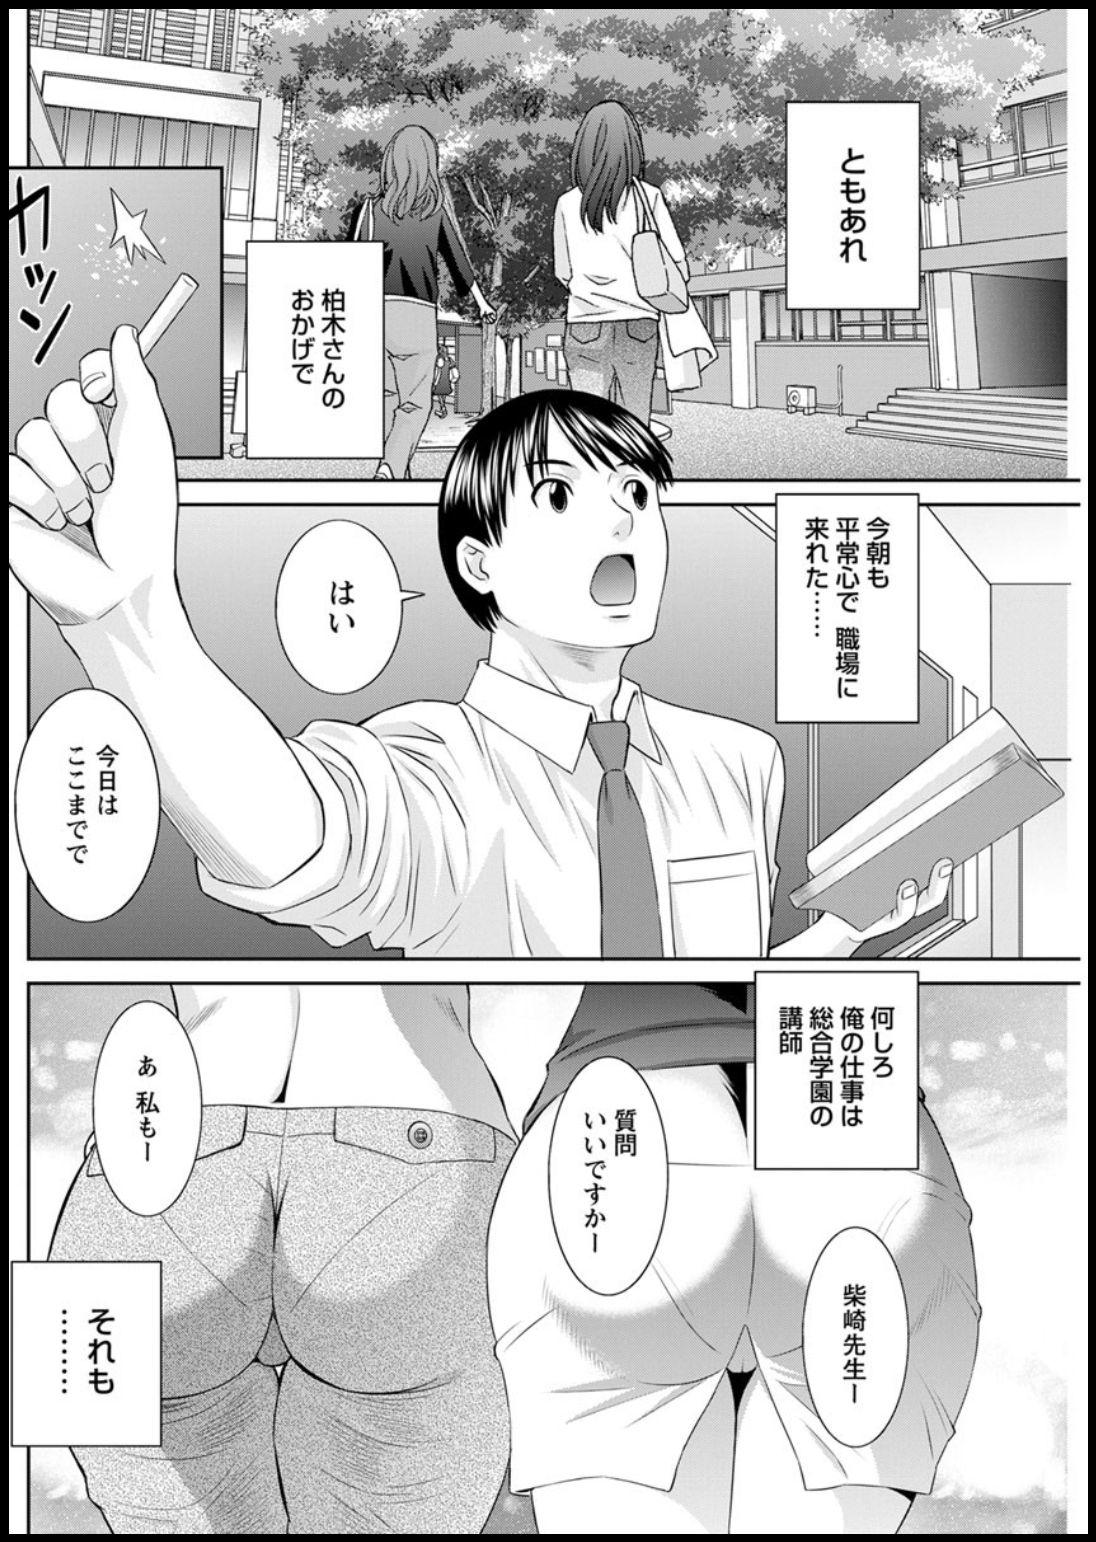 [Kawamori Misaki] Kaikan Hitotsuma Gakuen Ch. 1-6, 8-20 [Digital] 171